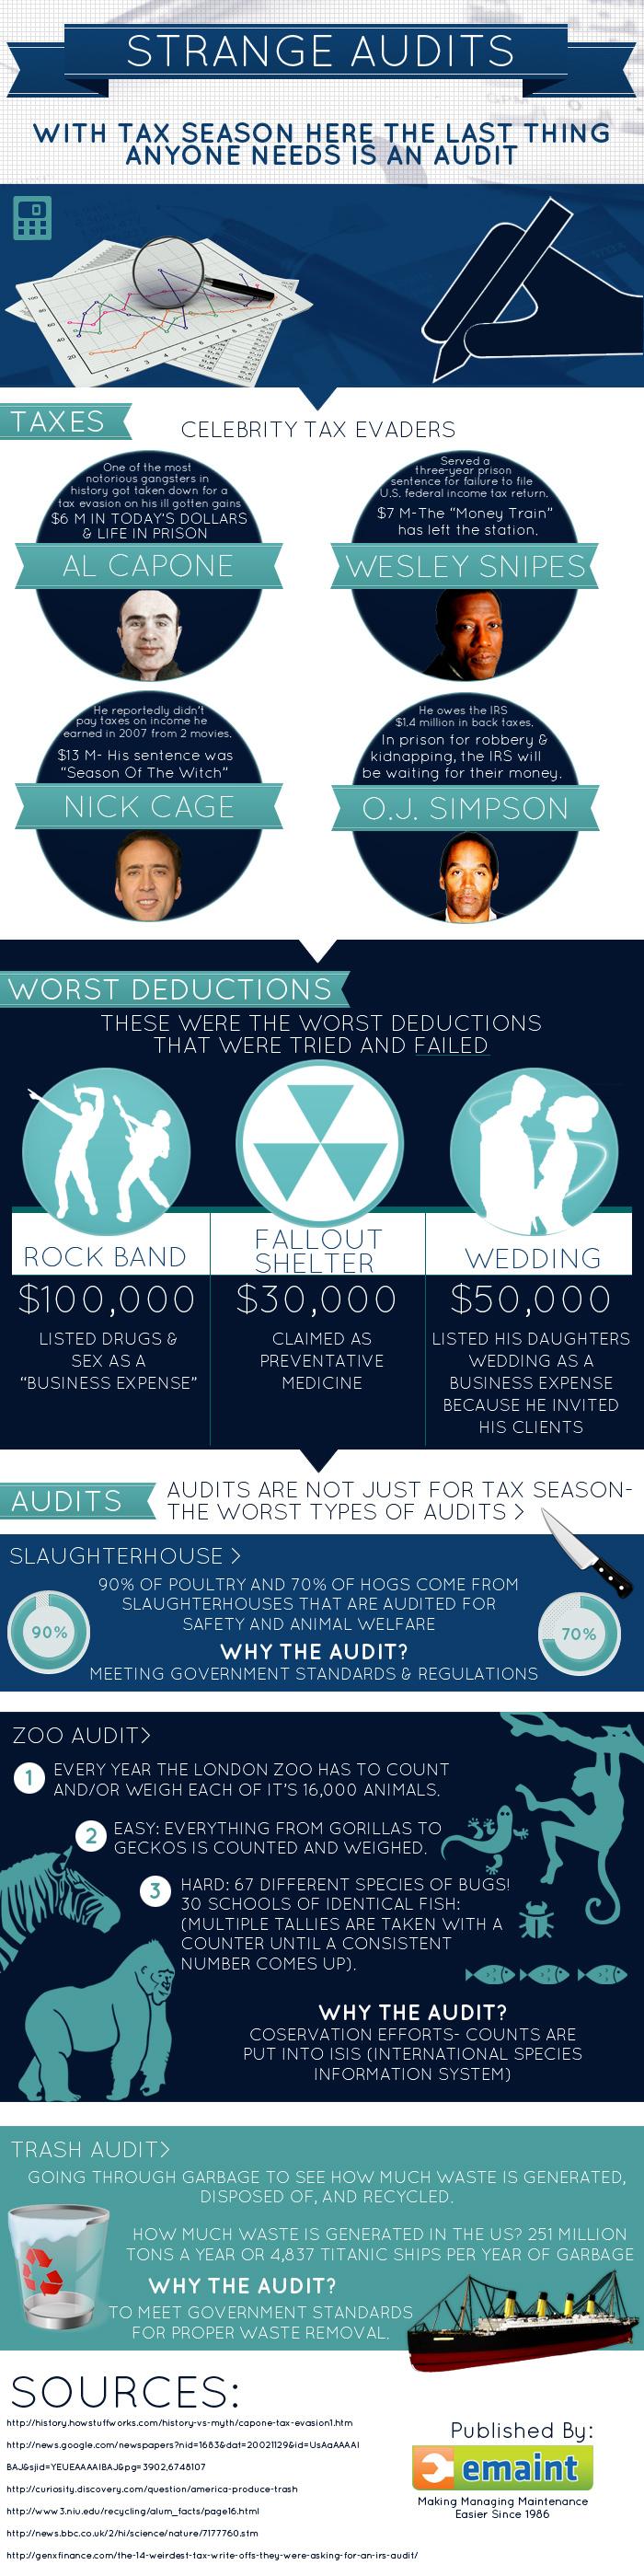 Strange Audits Infographic